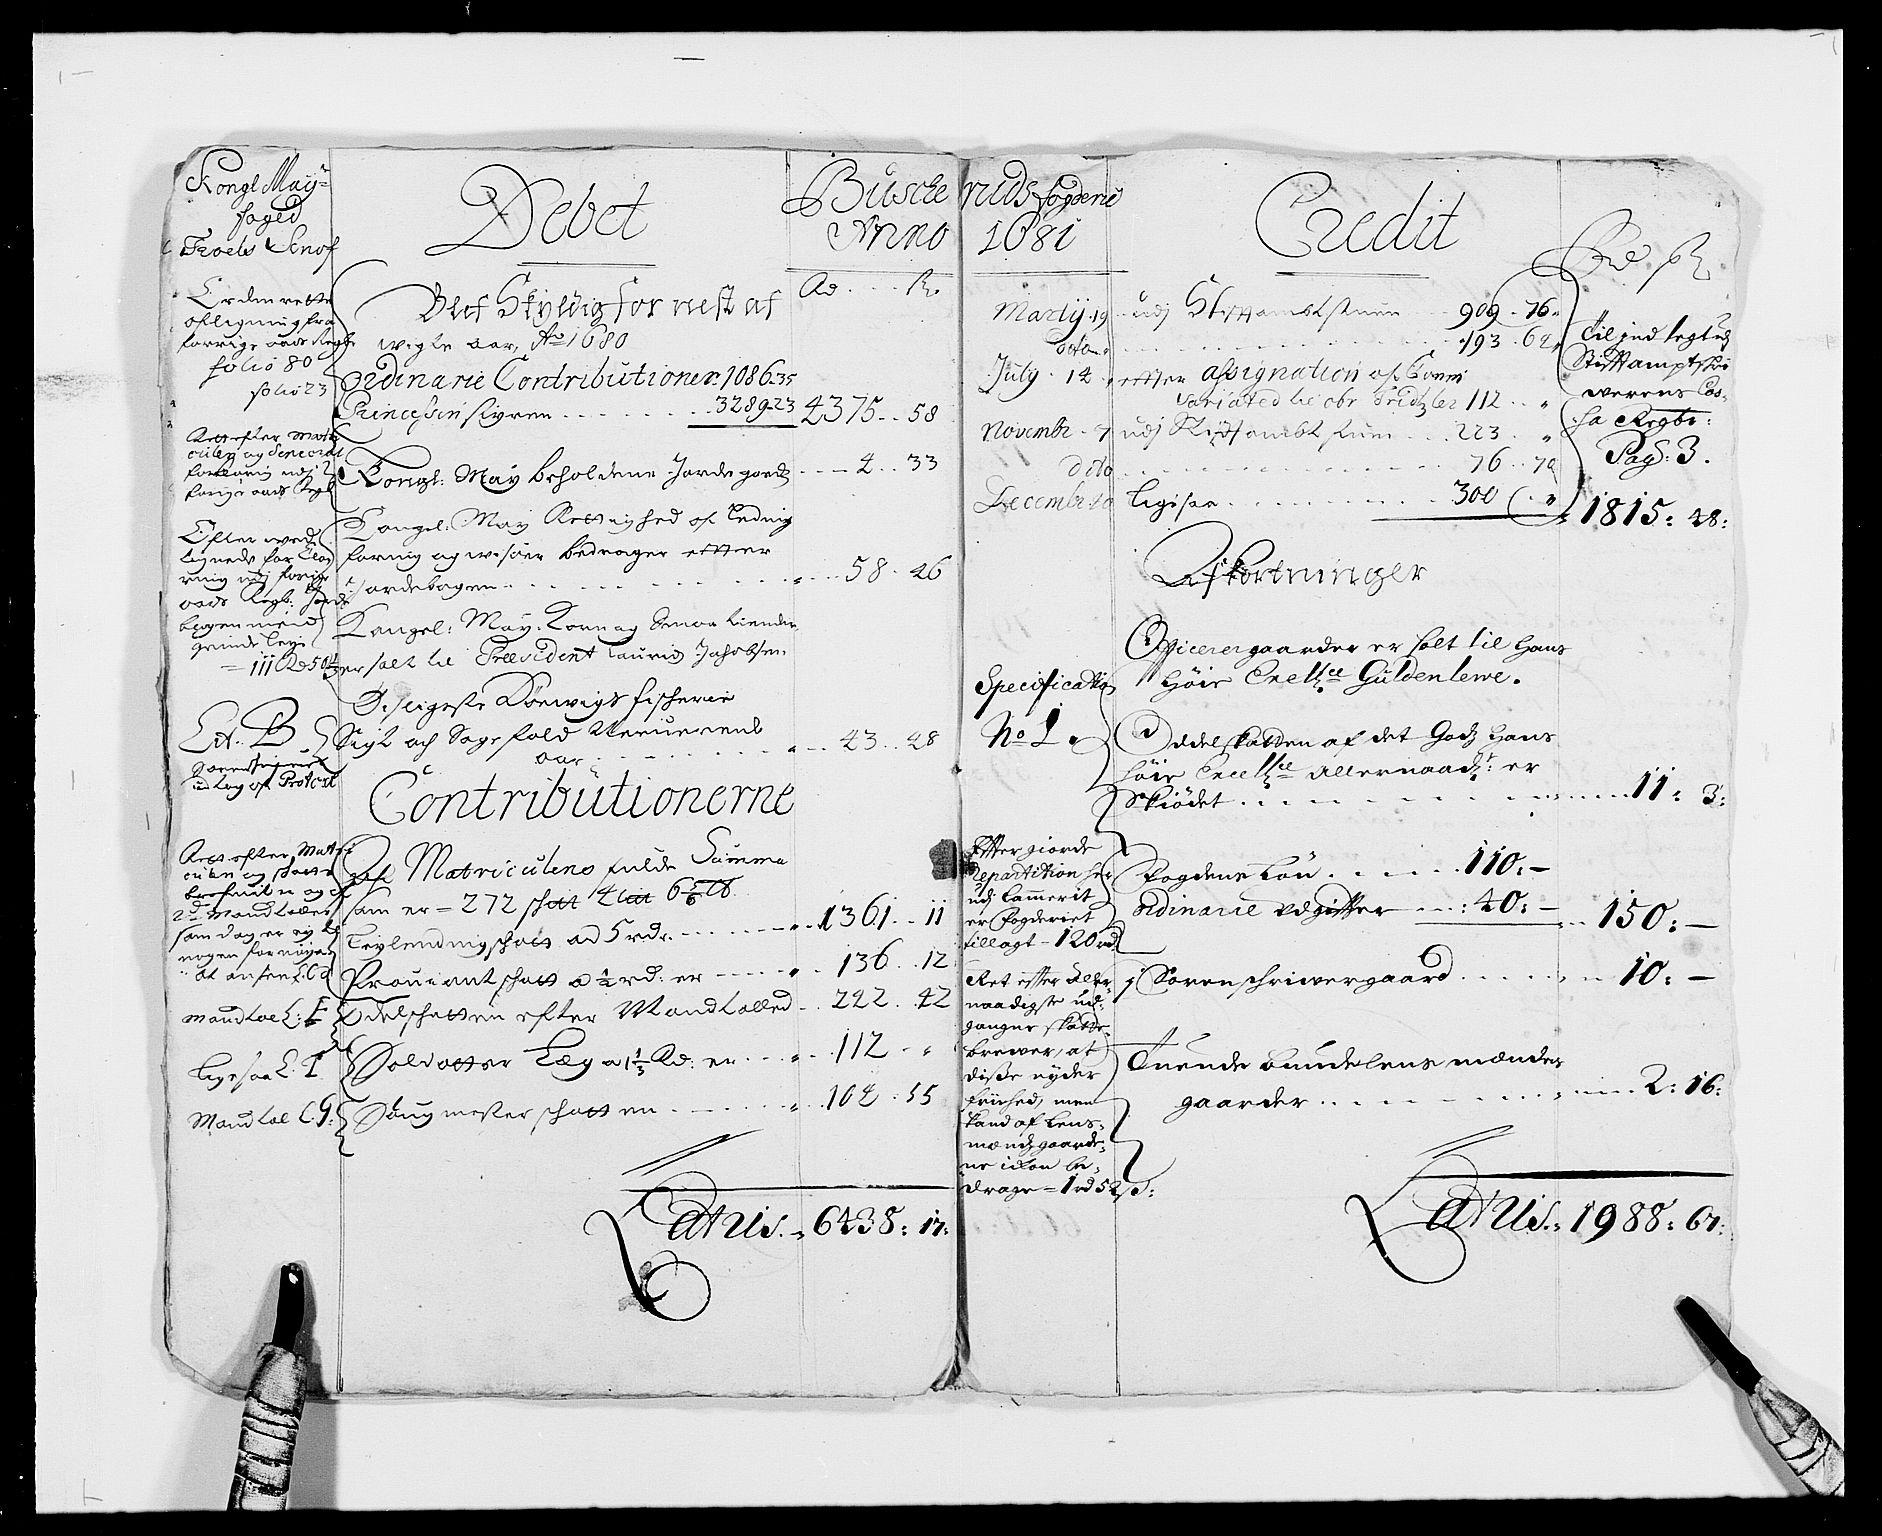 RA, Rentekammeret inntil 1814, Reviderte regnskaper, Fogderegnskap, R25/L1674: Fogderegnskap Buskerud, 1678-1681, s. 14